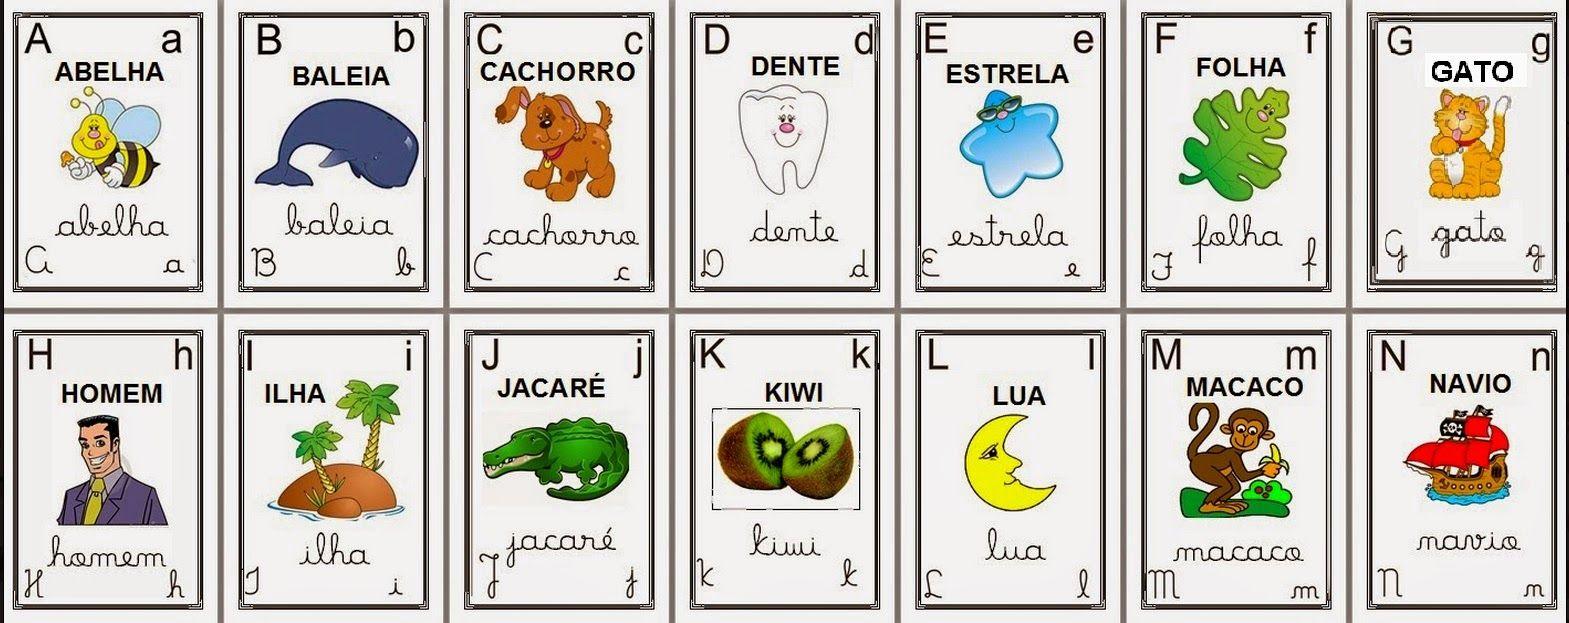 Resultado De Imagem Para Alfabeto Ilustrado Colorido Para Imprimir